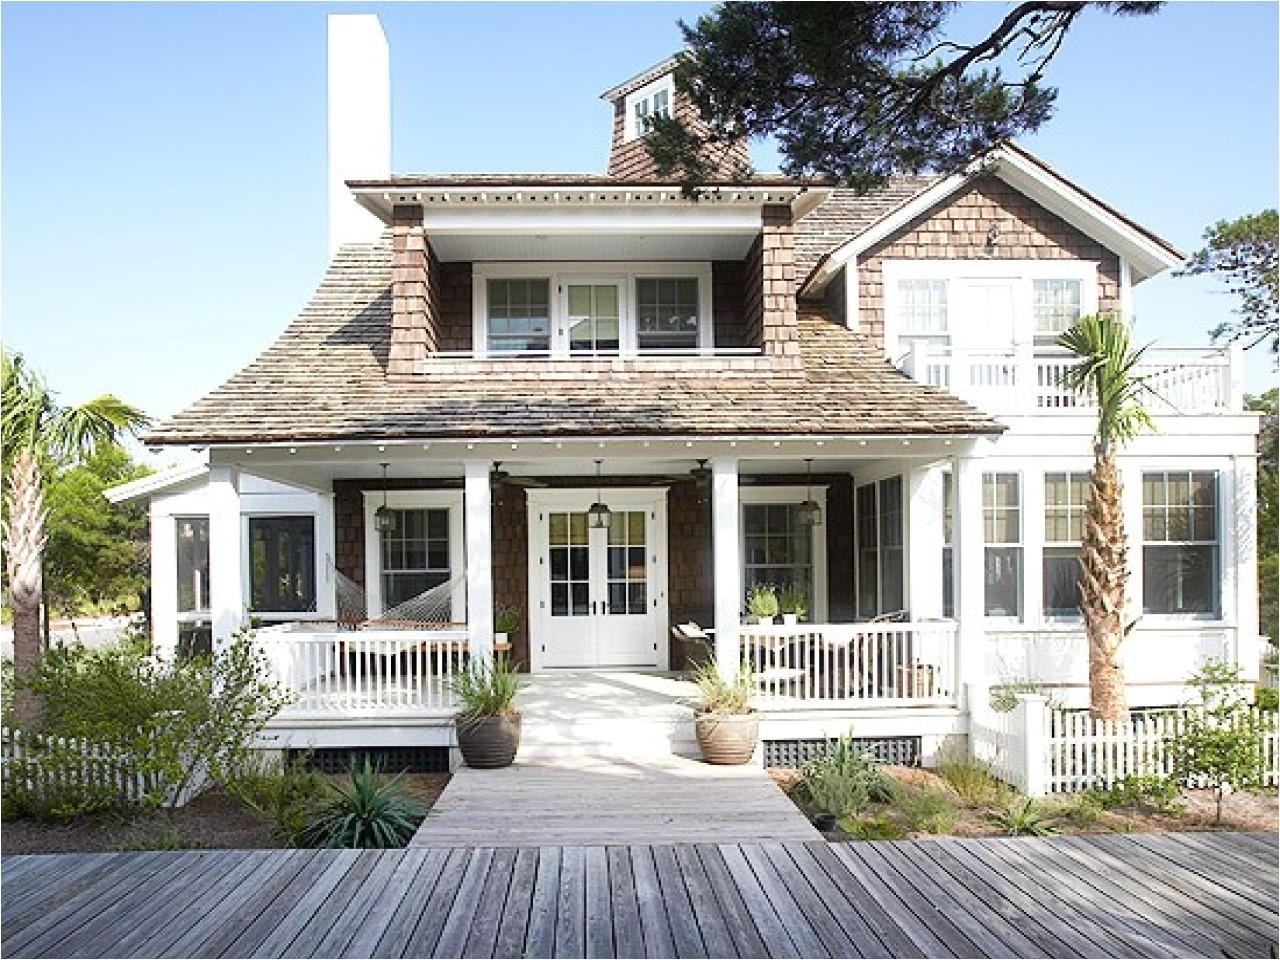 28c8f45be88d2d41 beach house exterior cute beach house exterior